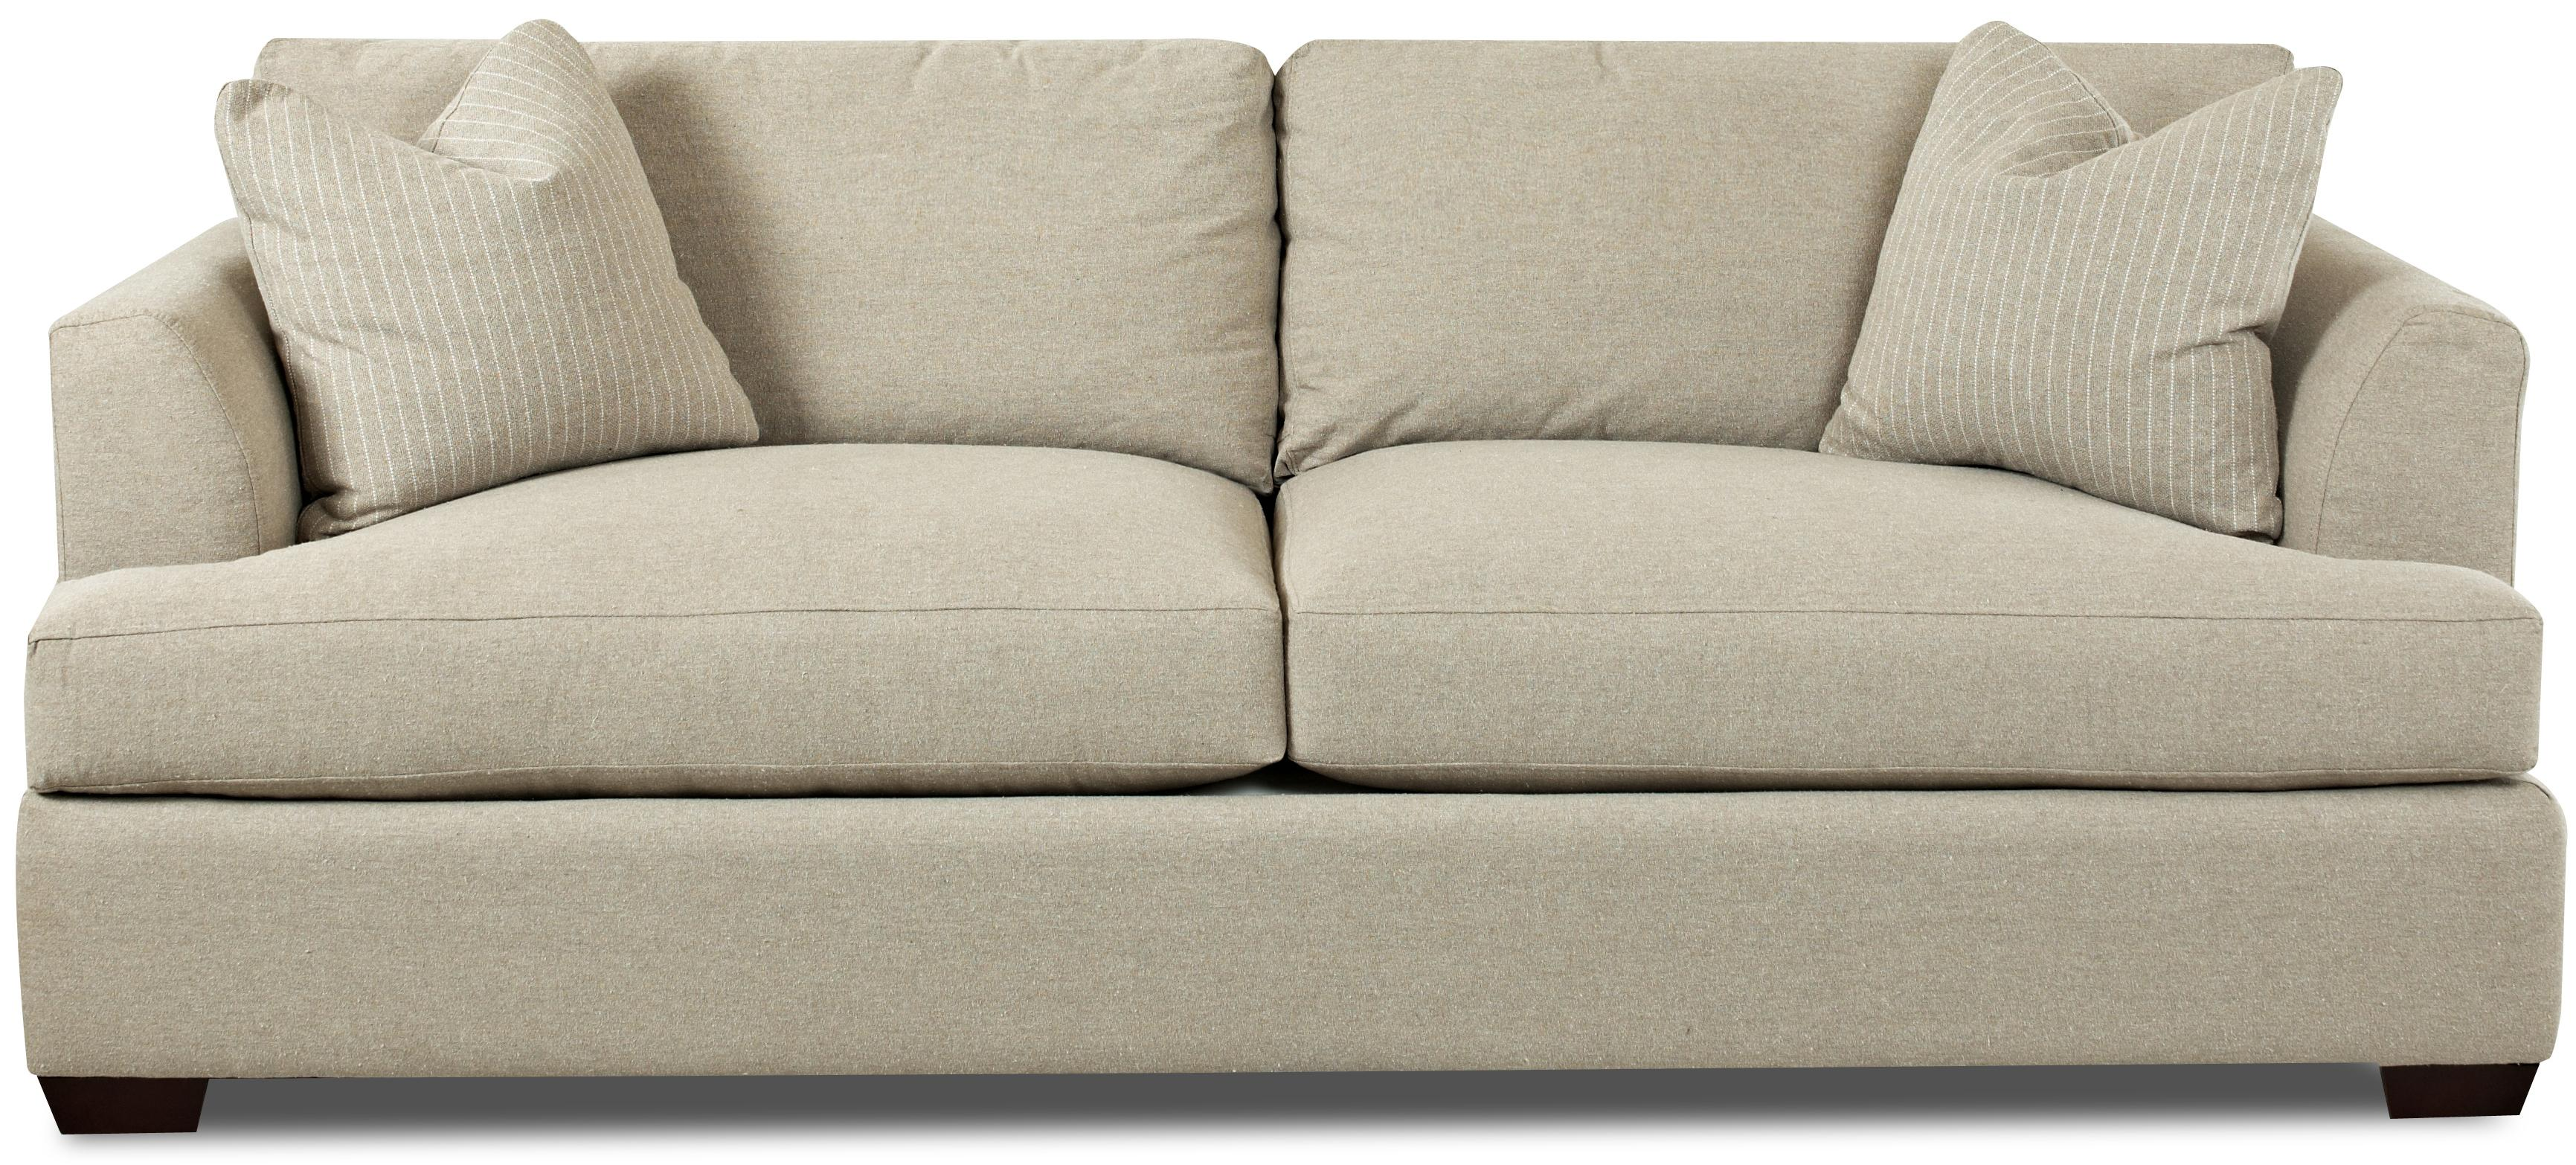 Bentley Dreamquest Sleeper Sofa by Klaussner at Northeast Factory Direct